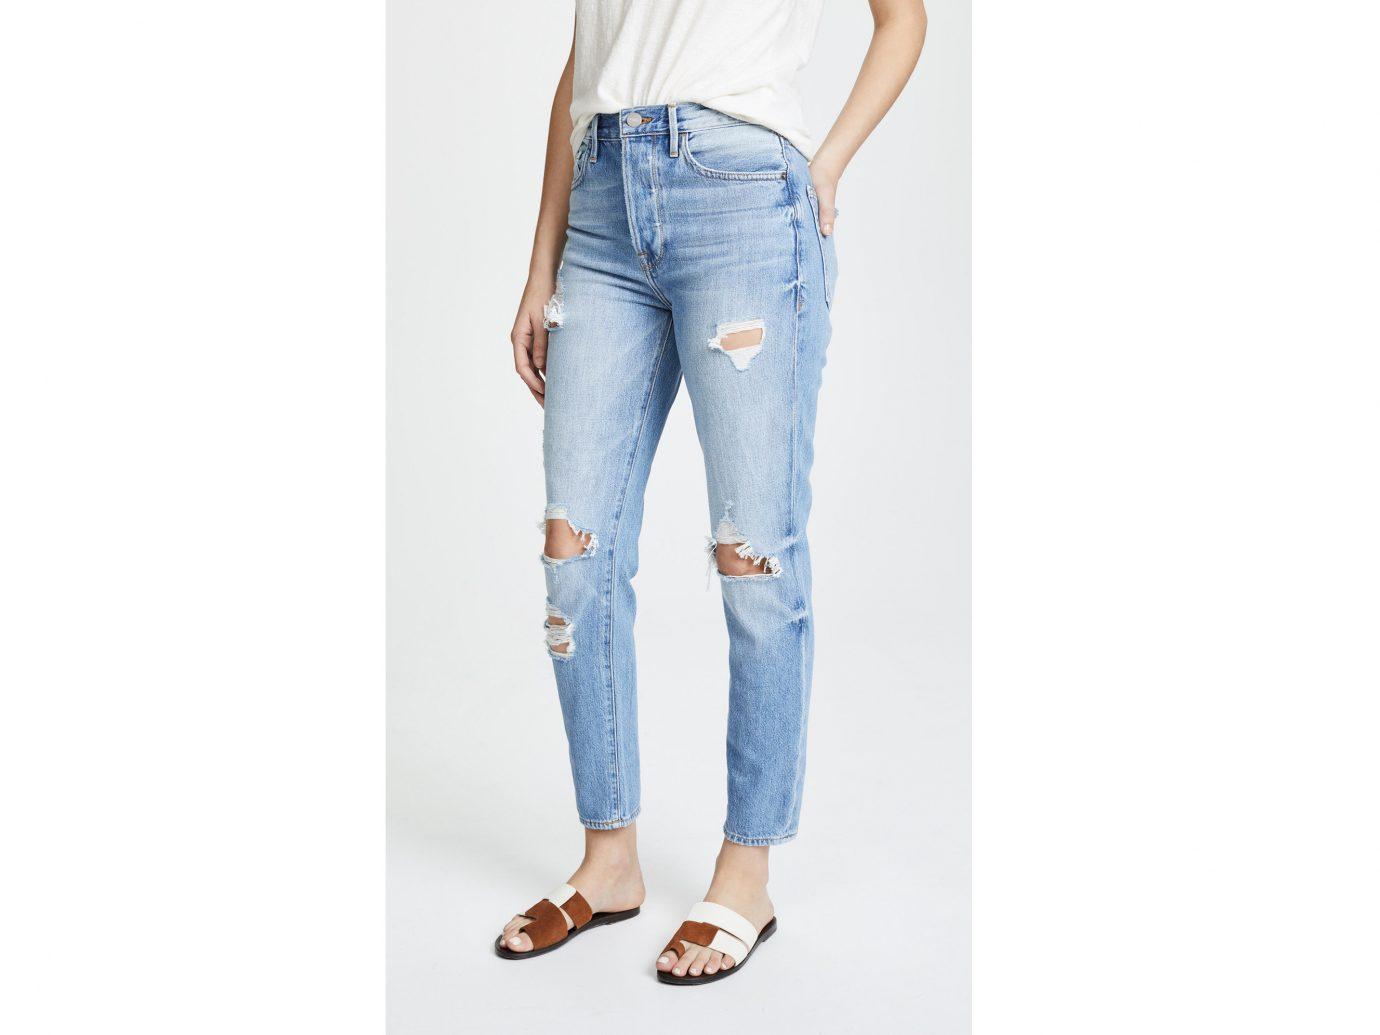 Girls Getaways Trip Ideas Weekend Getaways person clothing jeans denim trouser waist trousers joint pocket shoe posing